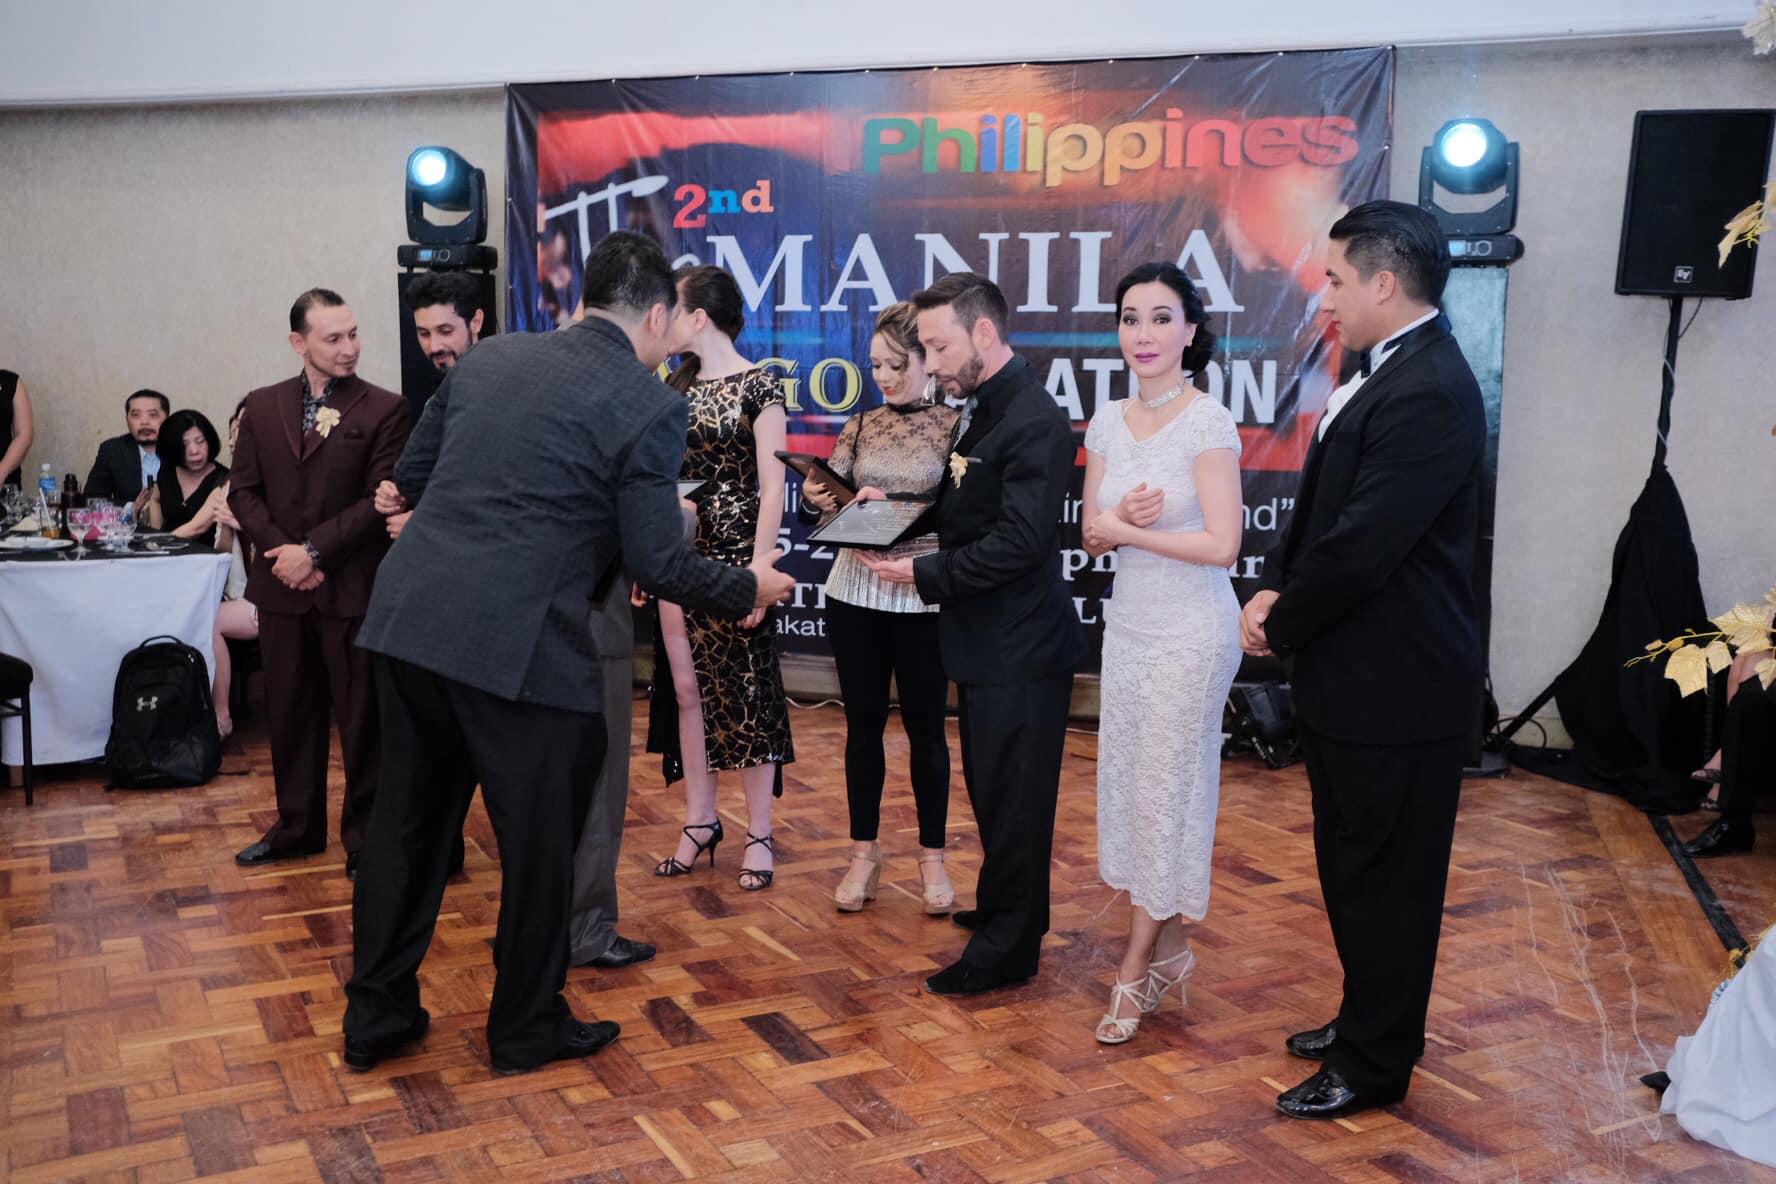 manila-tango-marathon-1.jpg